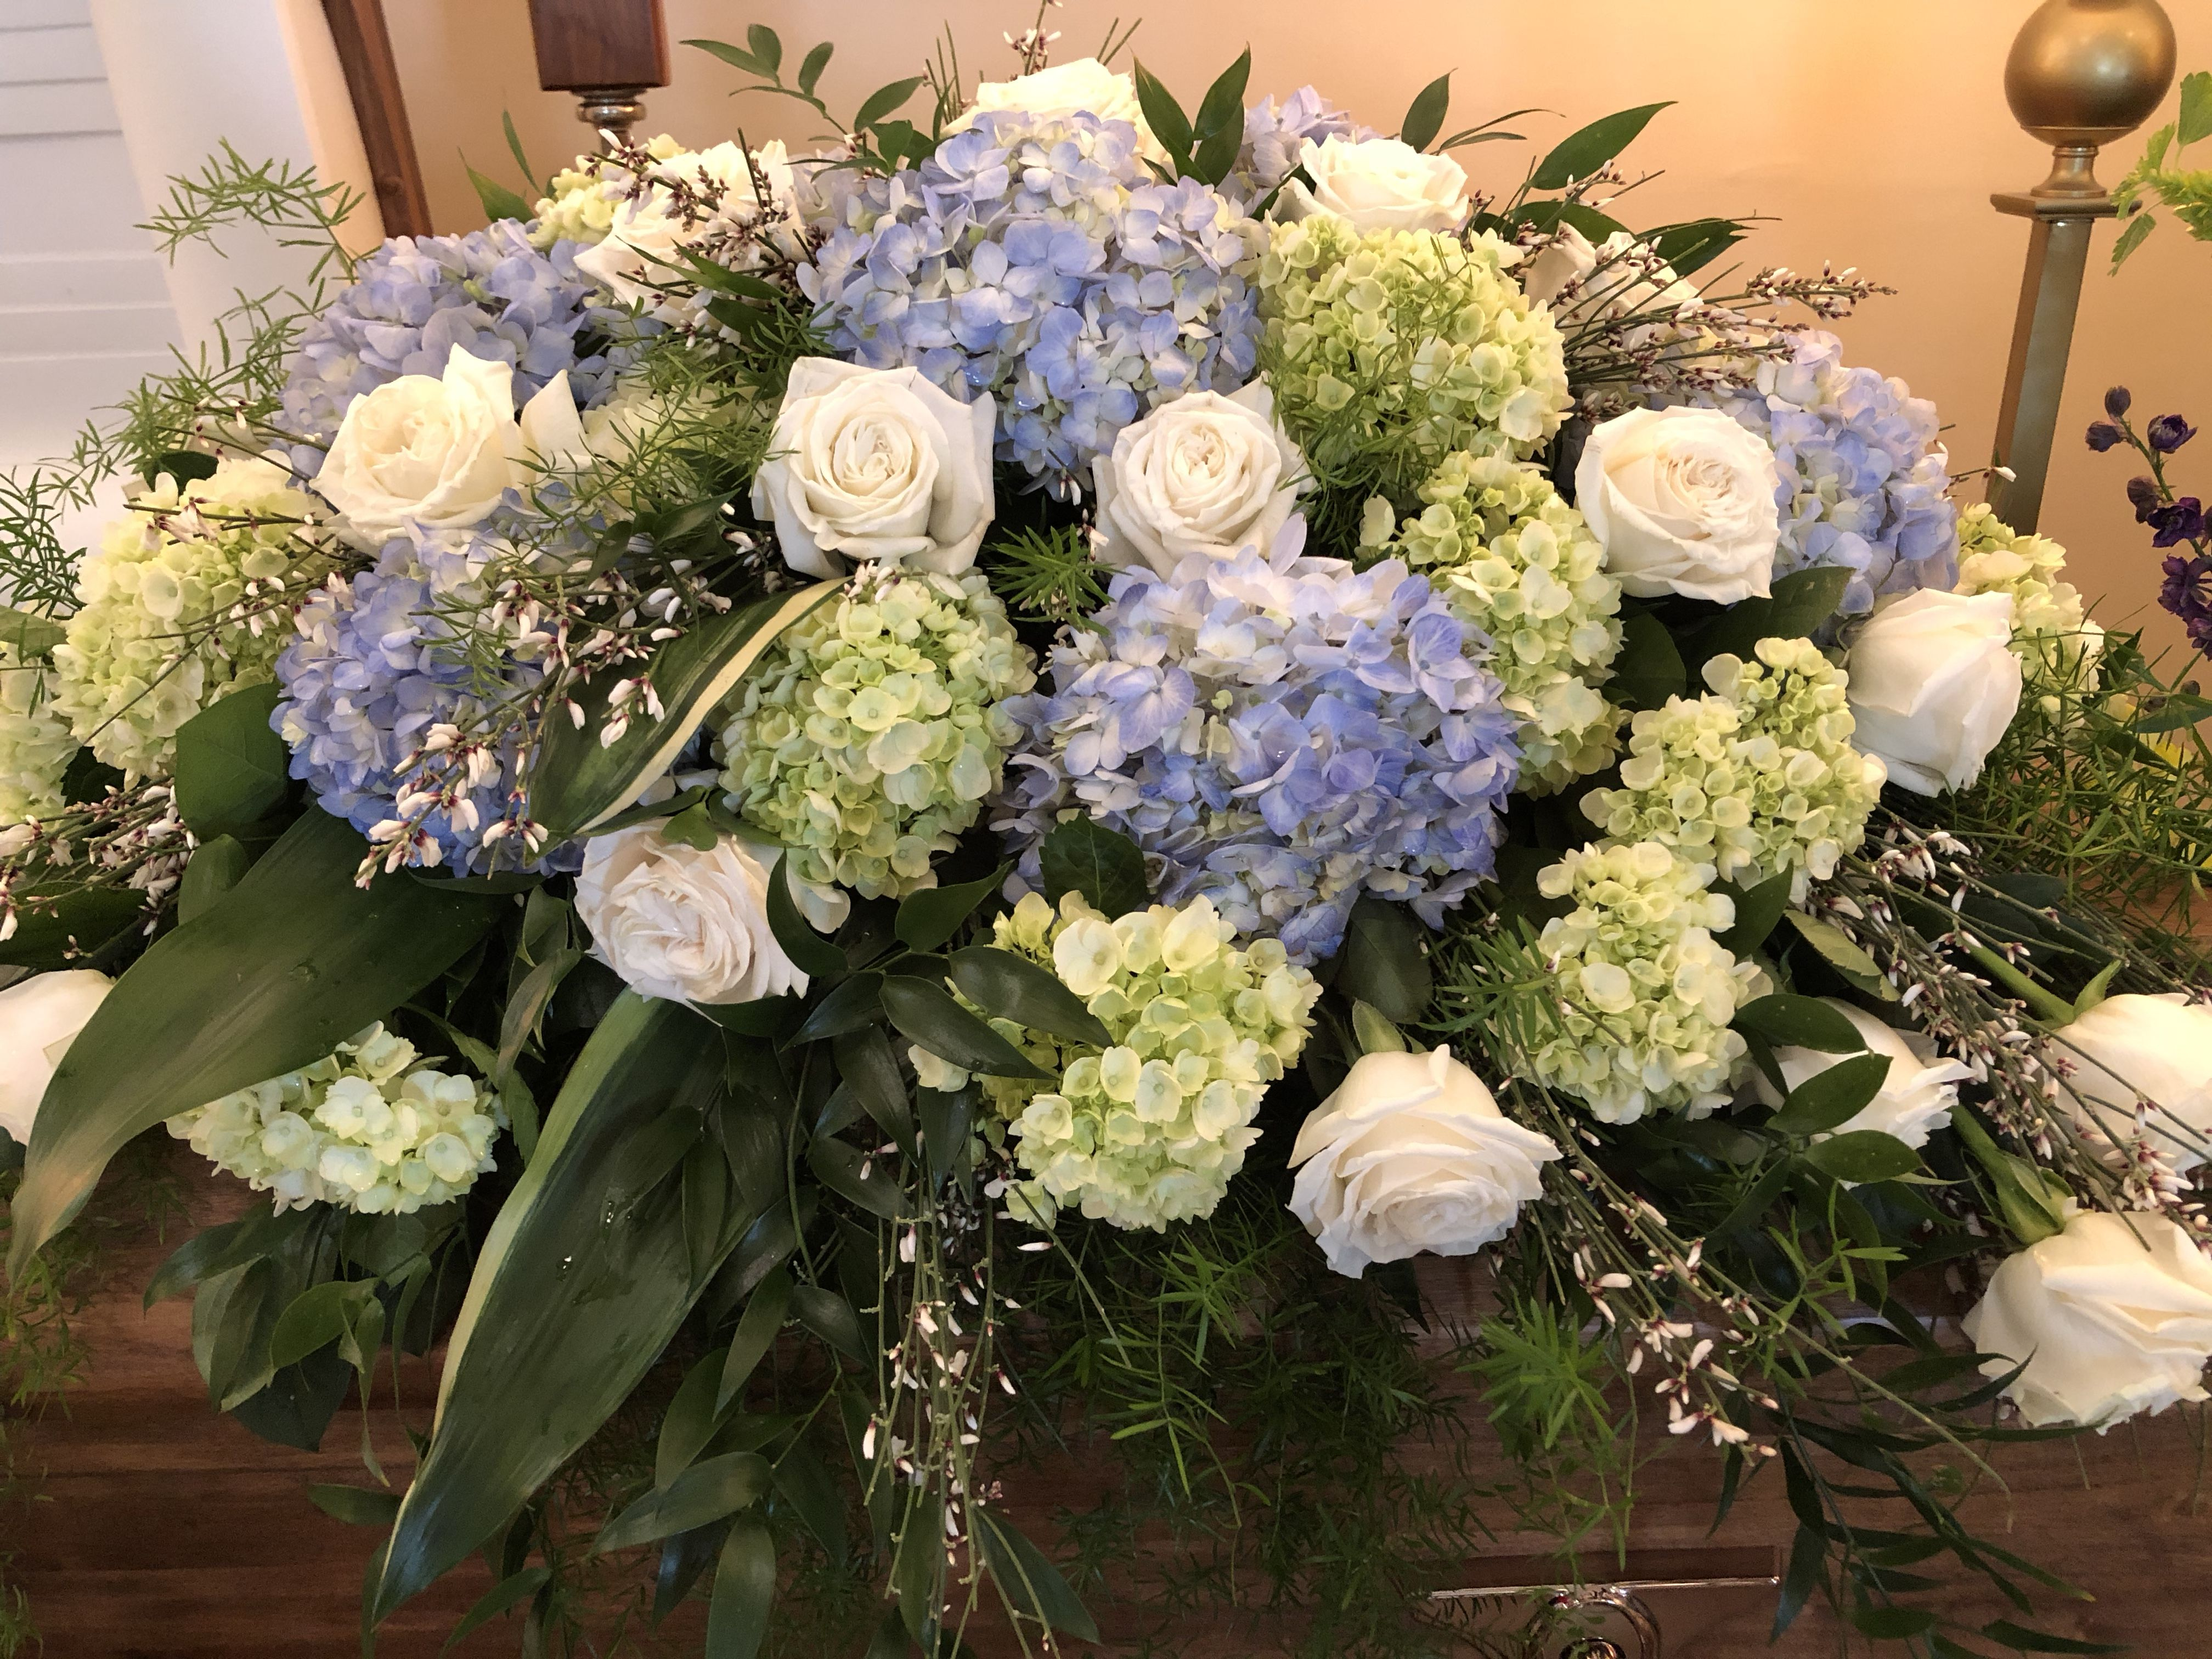 Hydrangea Rose Casket Spray Funeral Flower Arrangements Casket Flowers Hydrangea Flower Arrangements